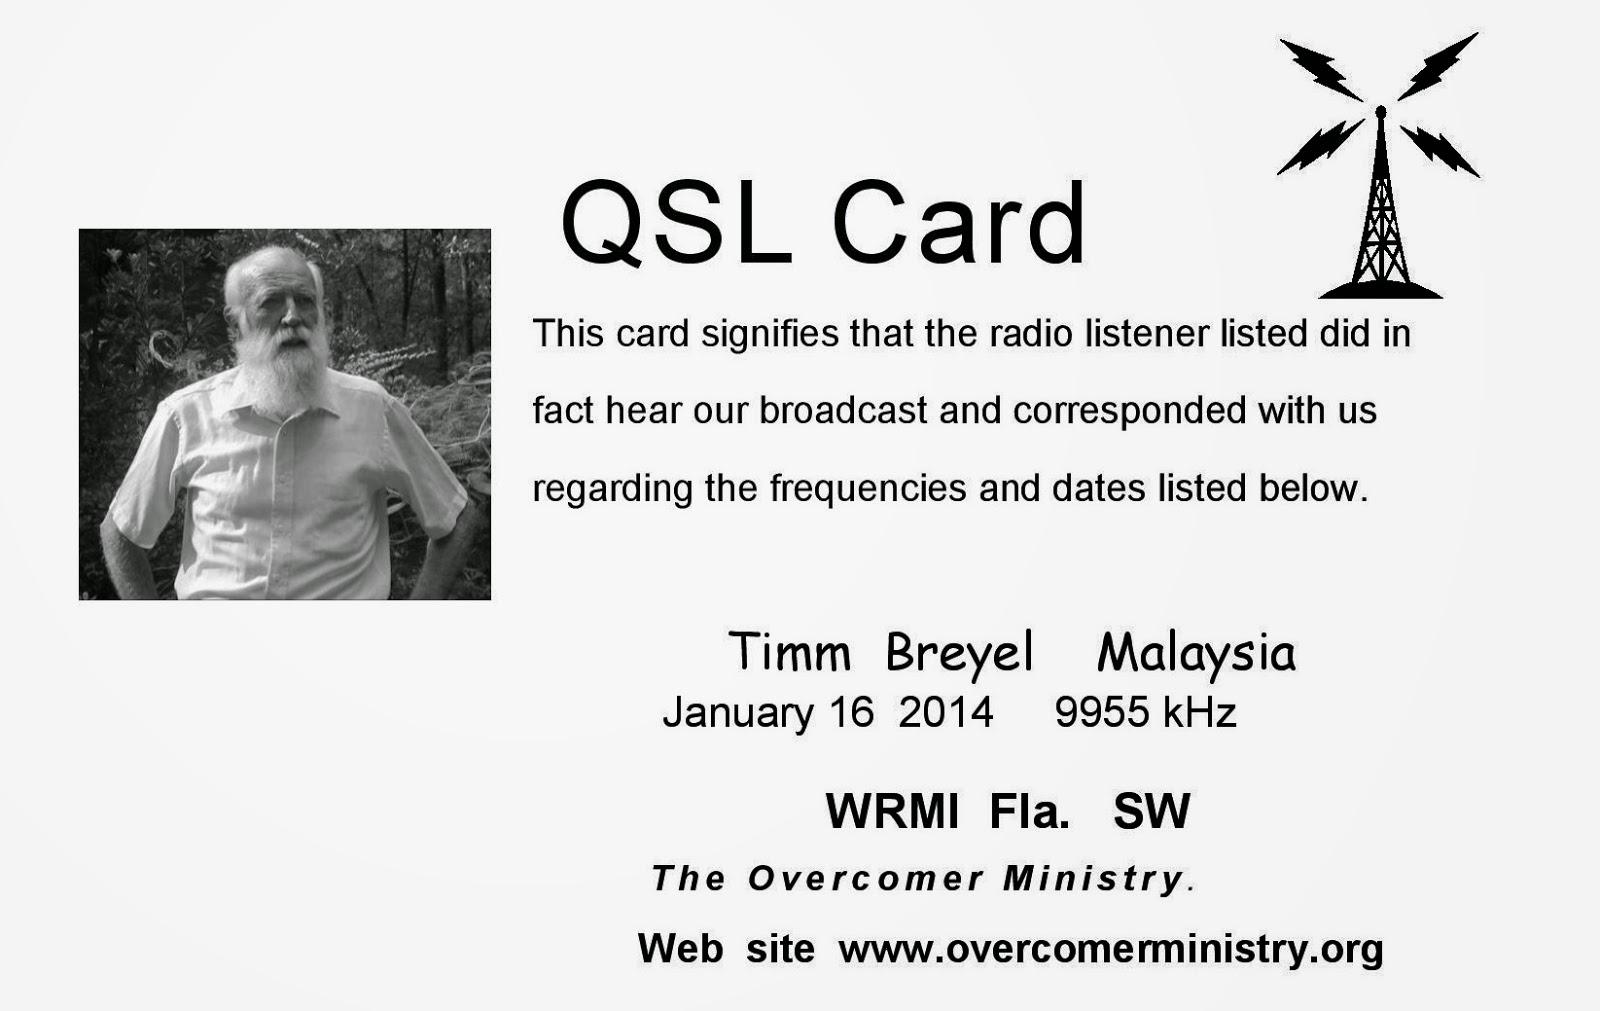 SOUTH EAST ASIA DXING: Overcomer Ministry / WRMI (Okeechobee)